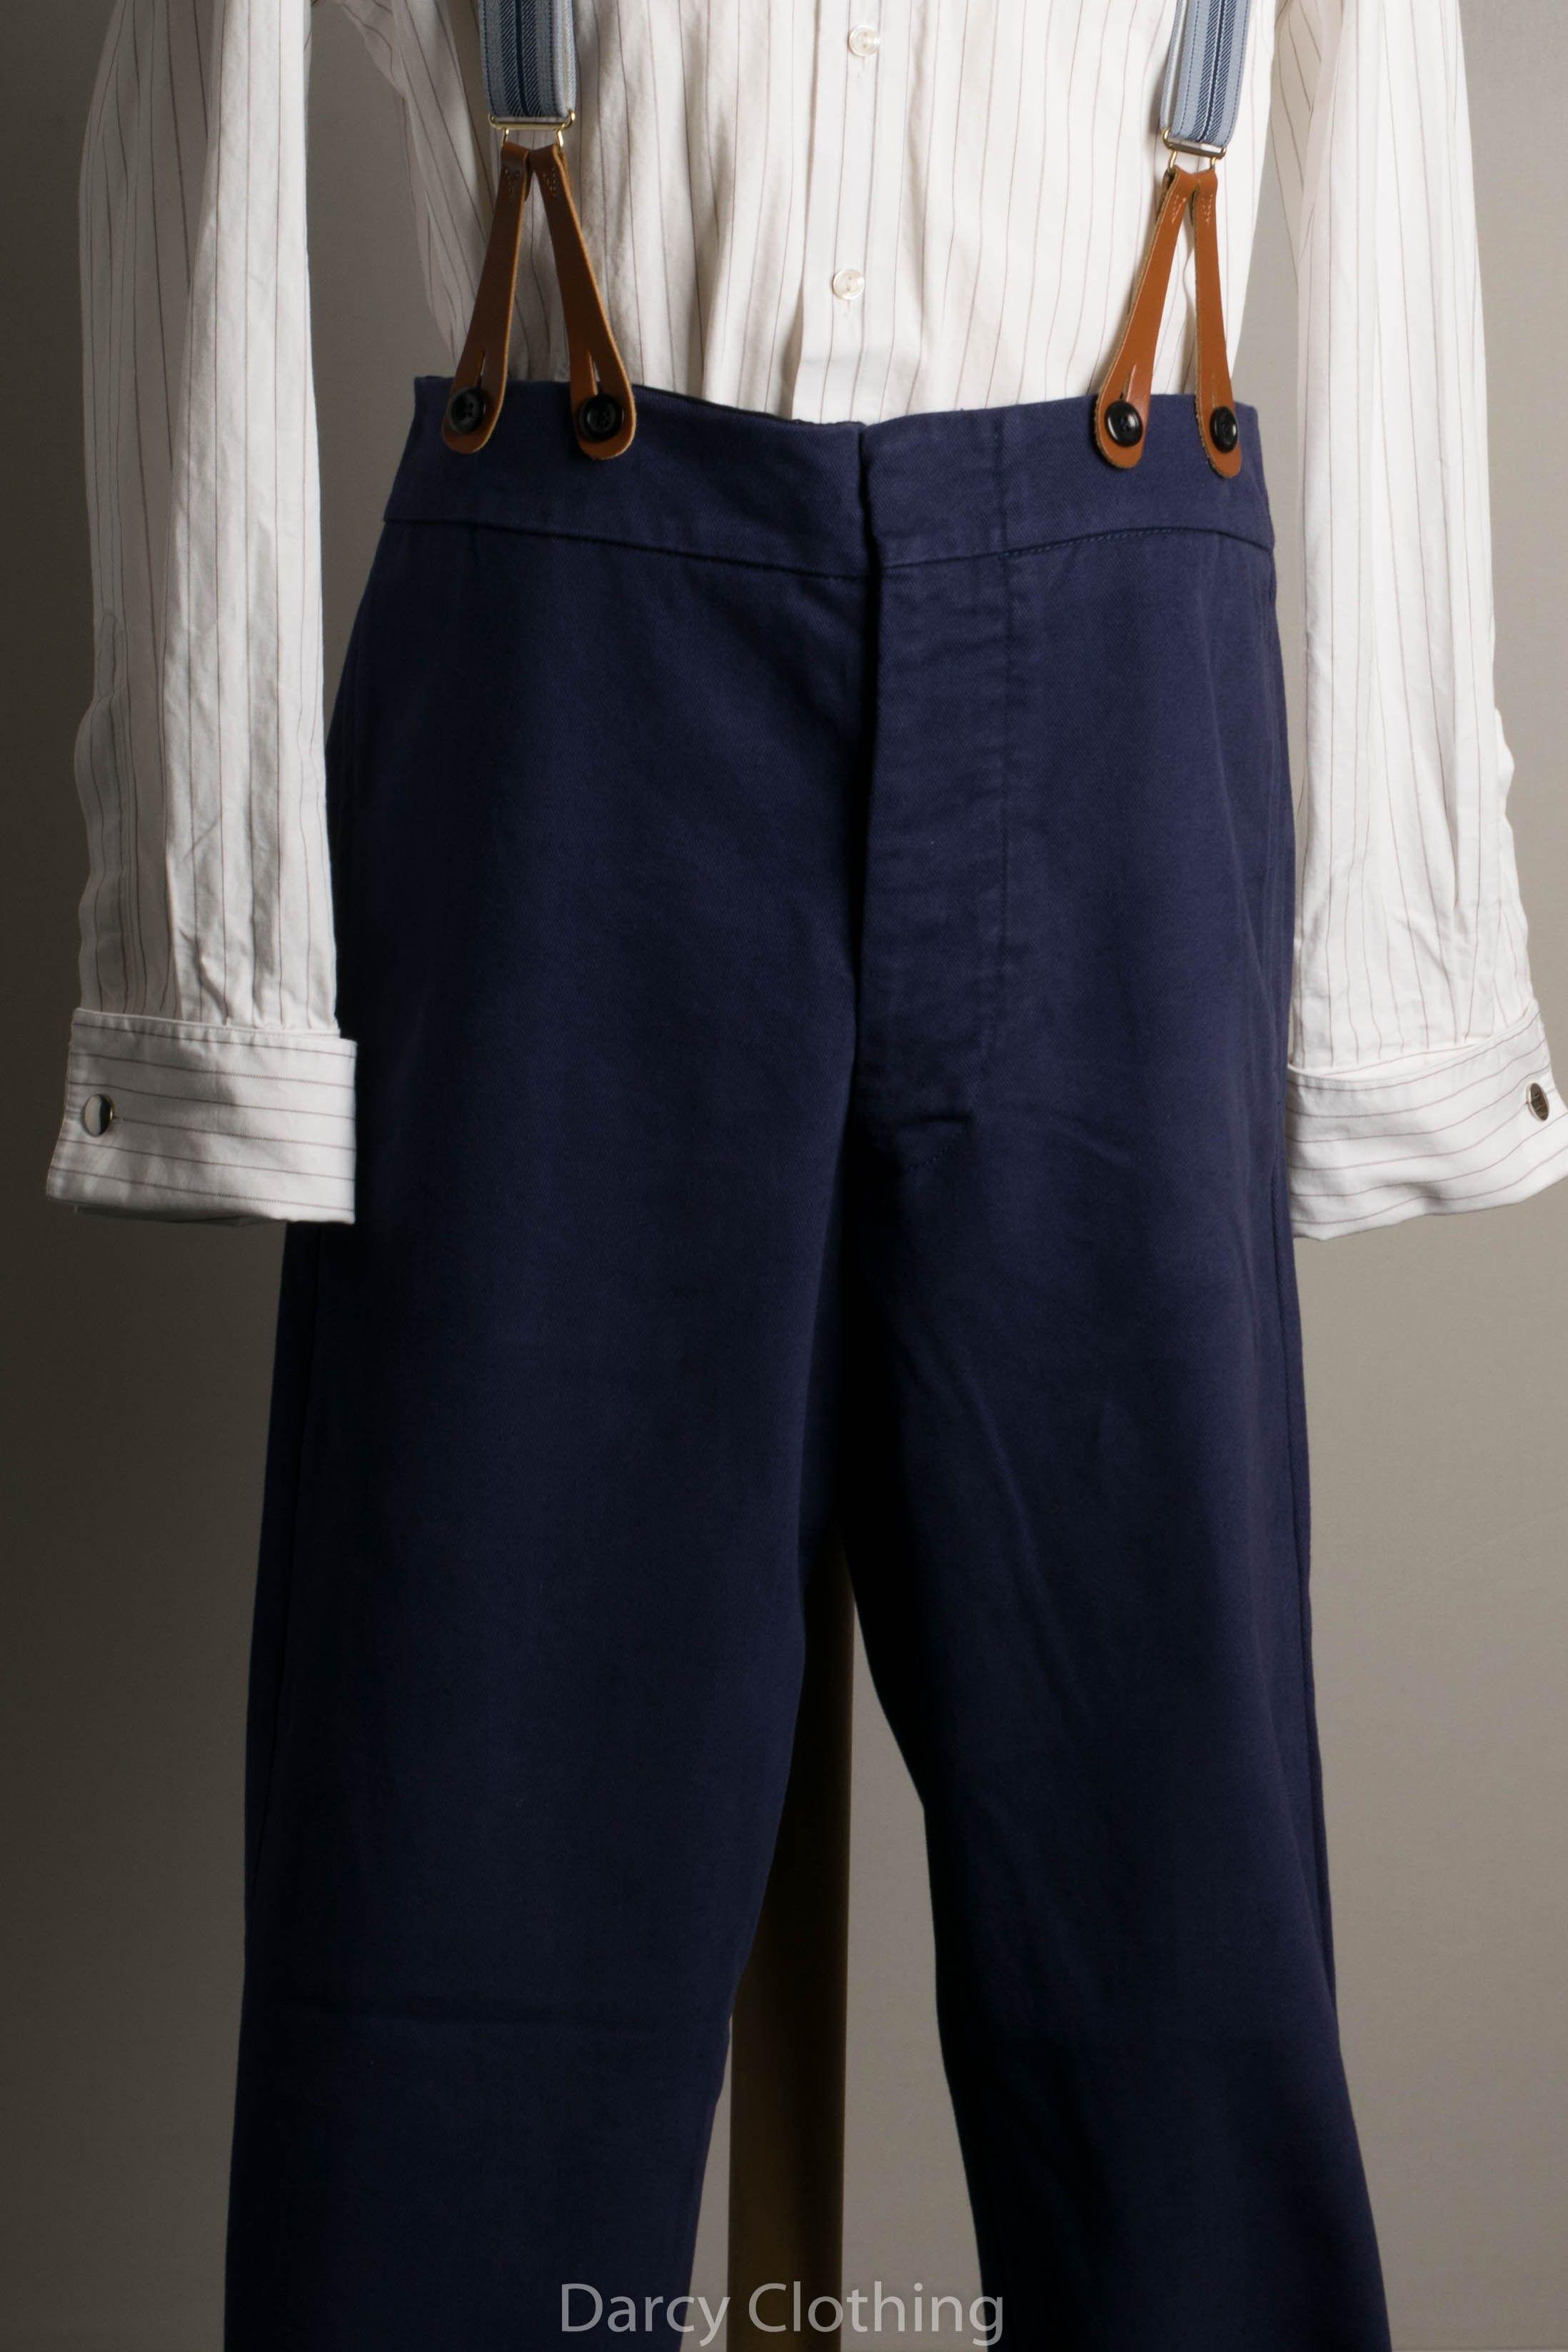 Navy Blue Leather End Braces